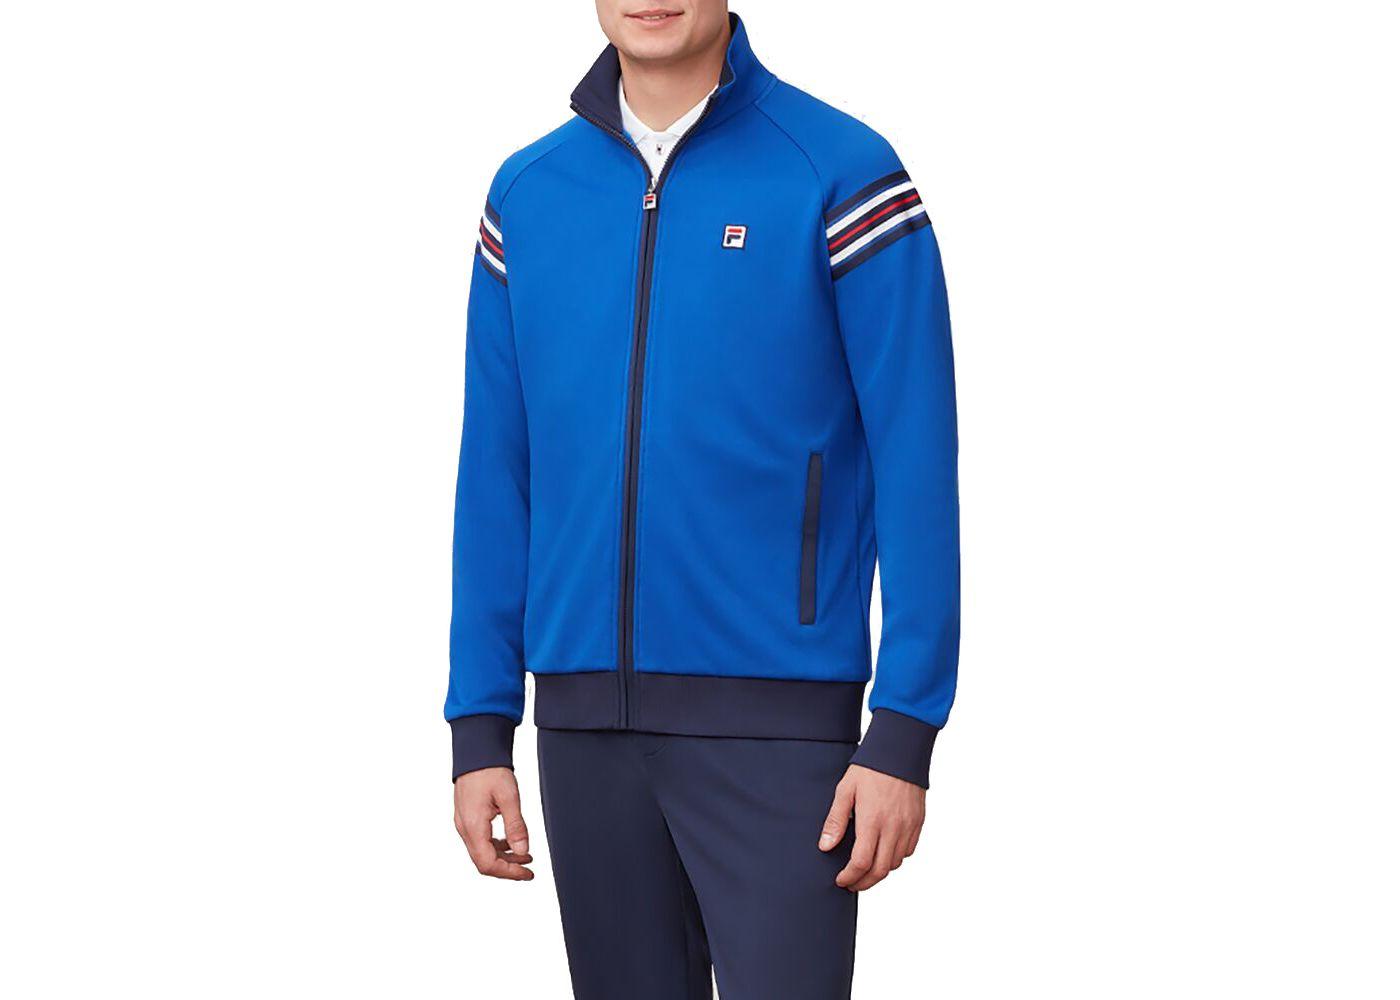 Fila Men's Heritage Warm-Up Tennis Jacket